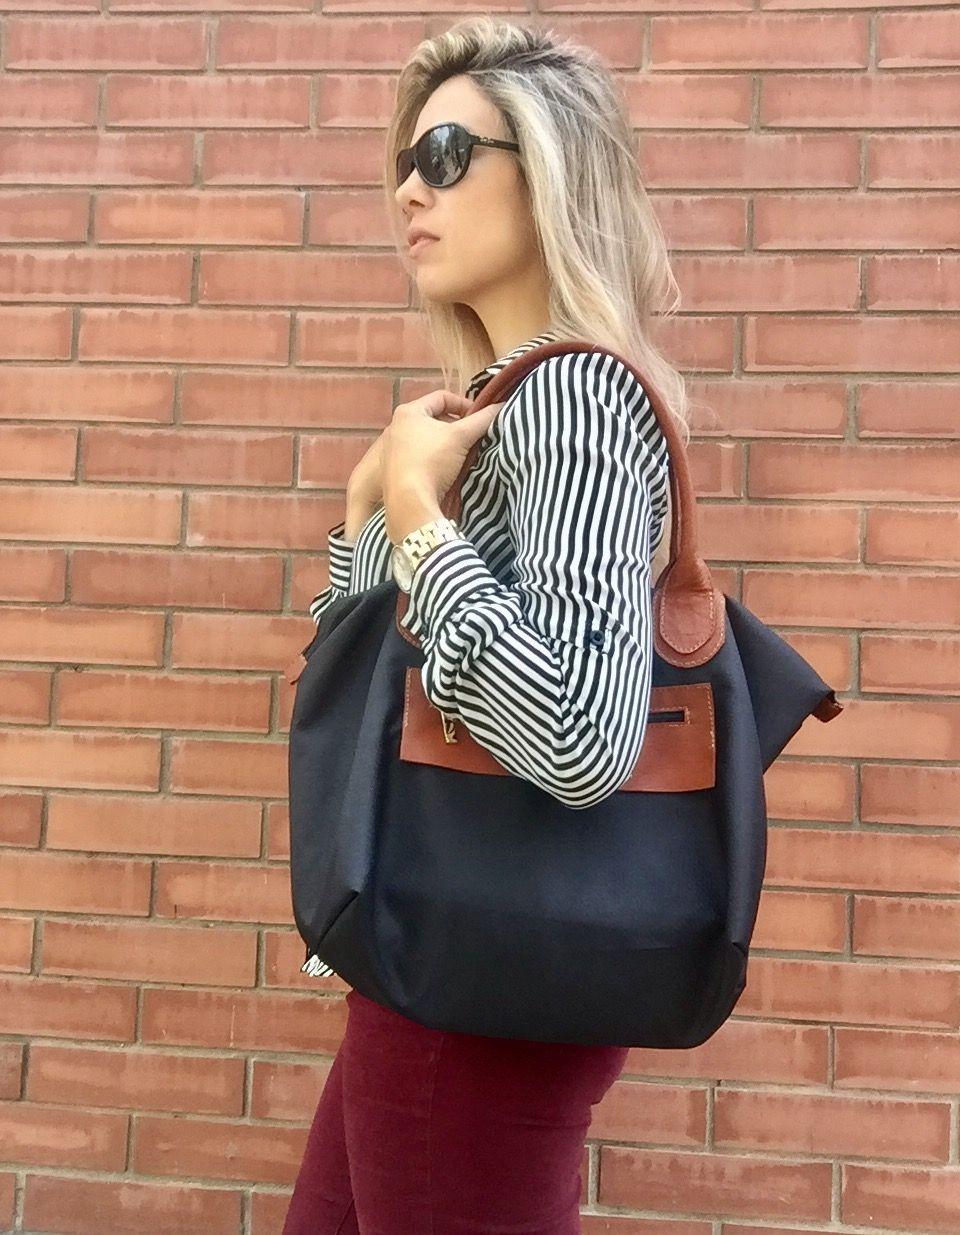 Carteras de moda y cuero para mujeres en PLUMSHOPONLINE.COM Leather and fashion womens handbags #bags #bag #moda #clutch #outfit - Cartera Negra Noa